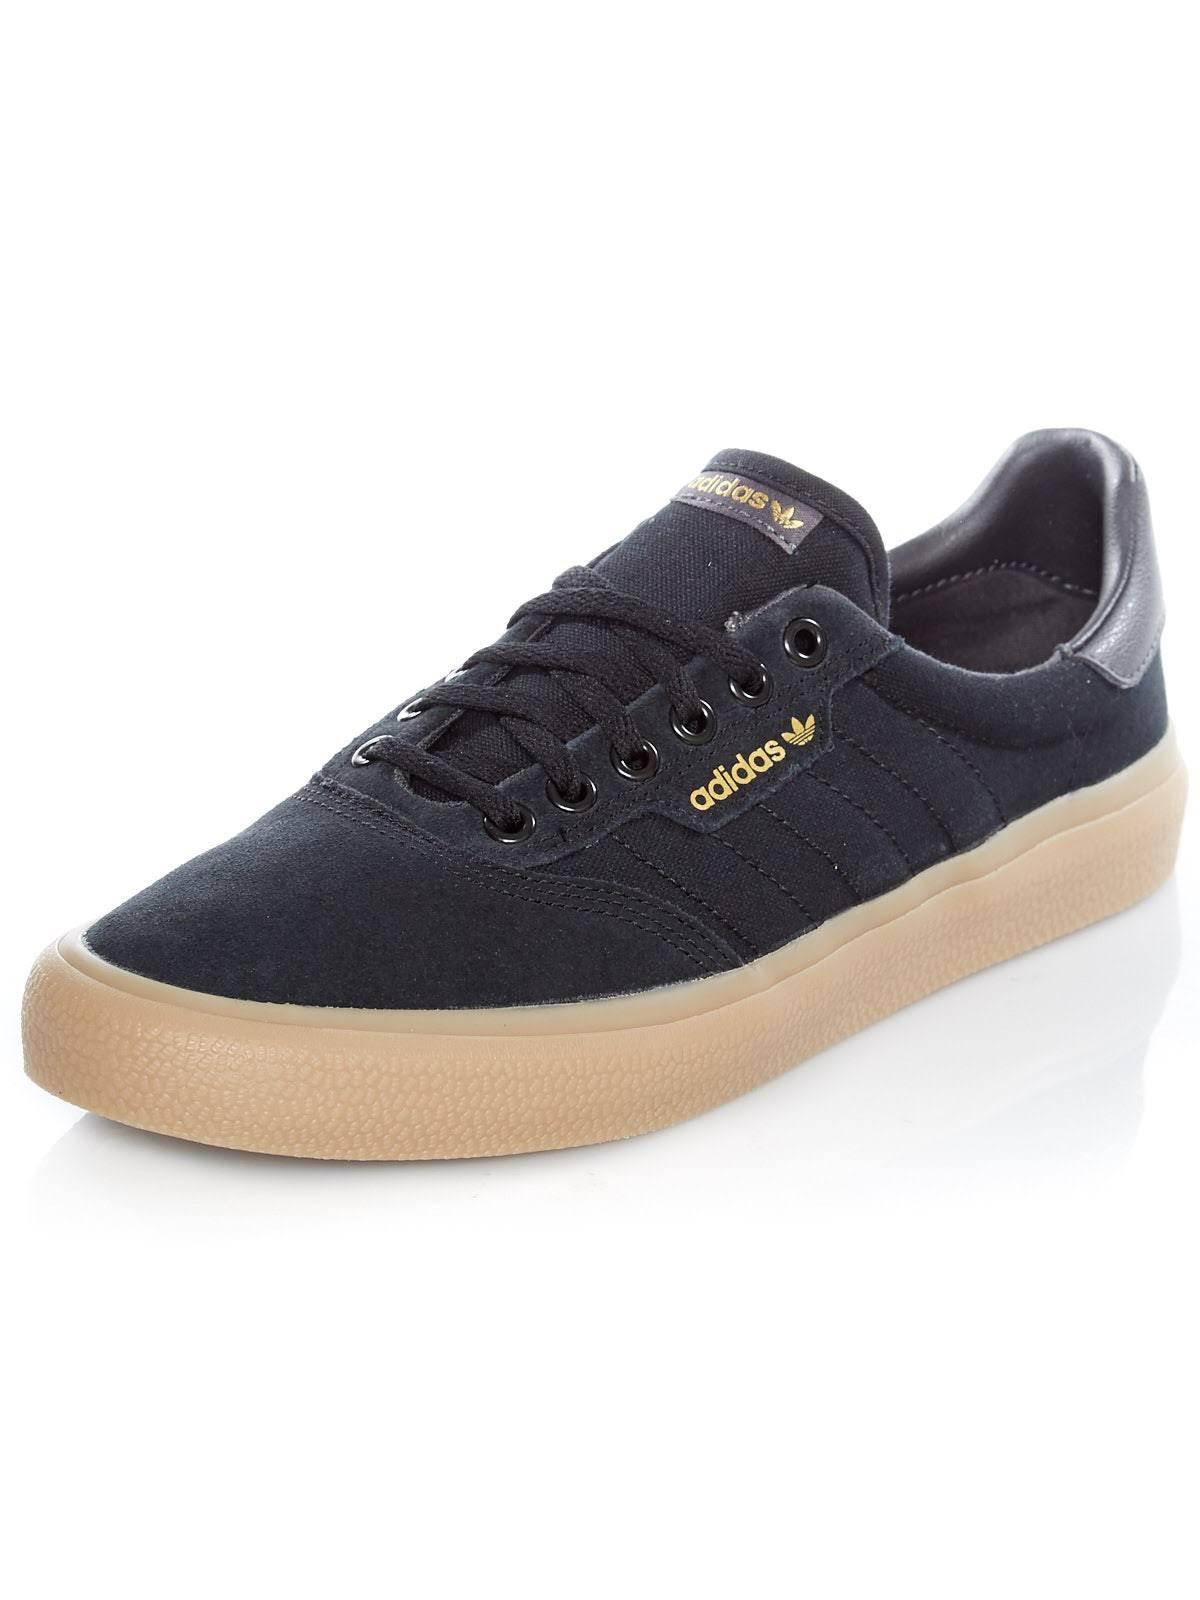 Adidas 3MC Vulc Shoes - Core Black/Solid Grey/Gum